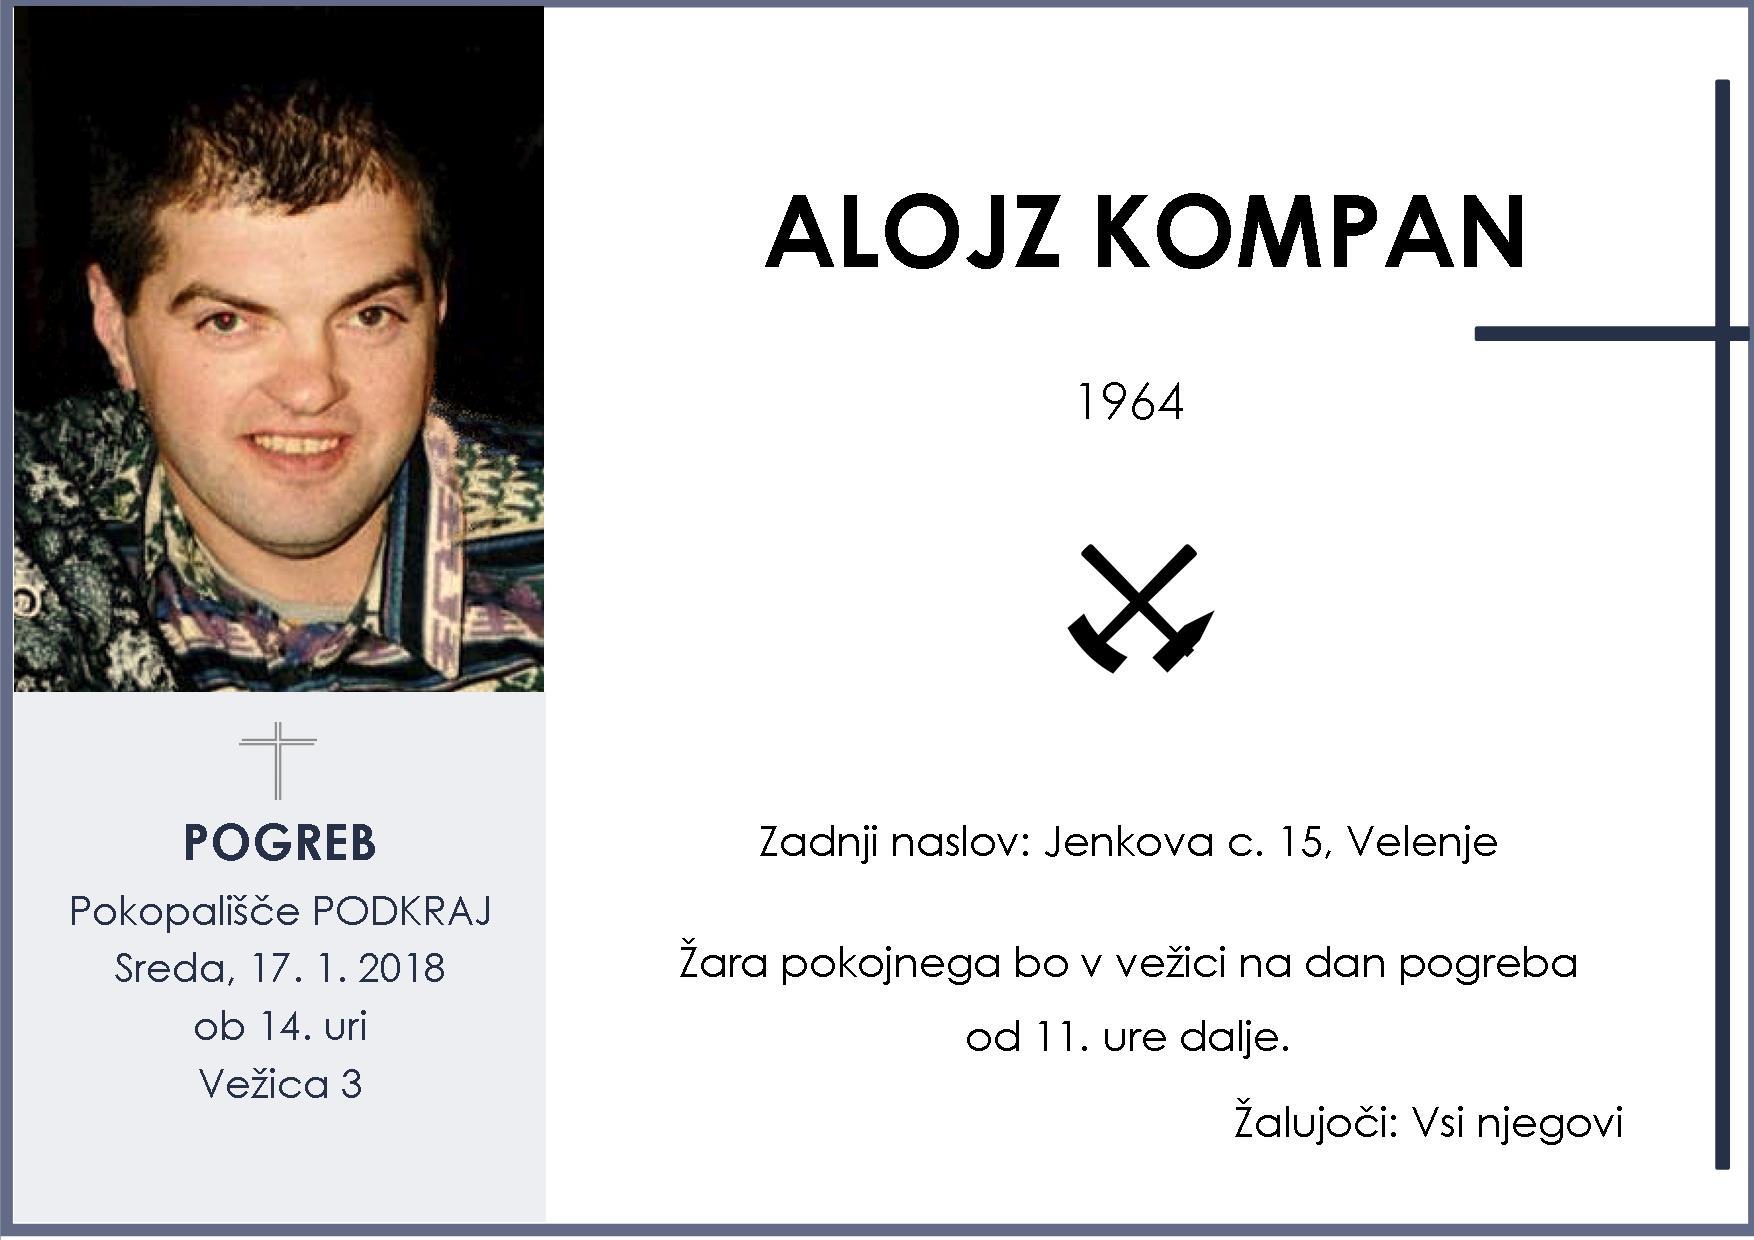 ALOJZ KOMPAN, Podkraj, 17. 01. 2018